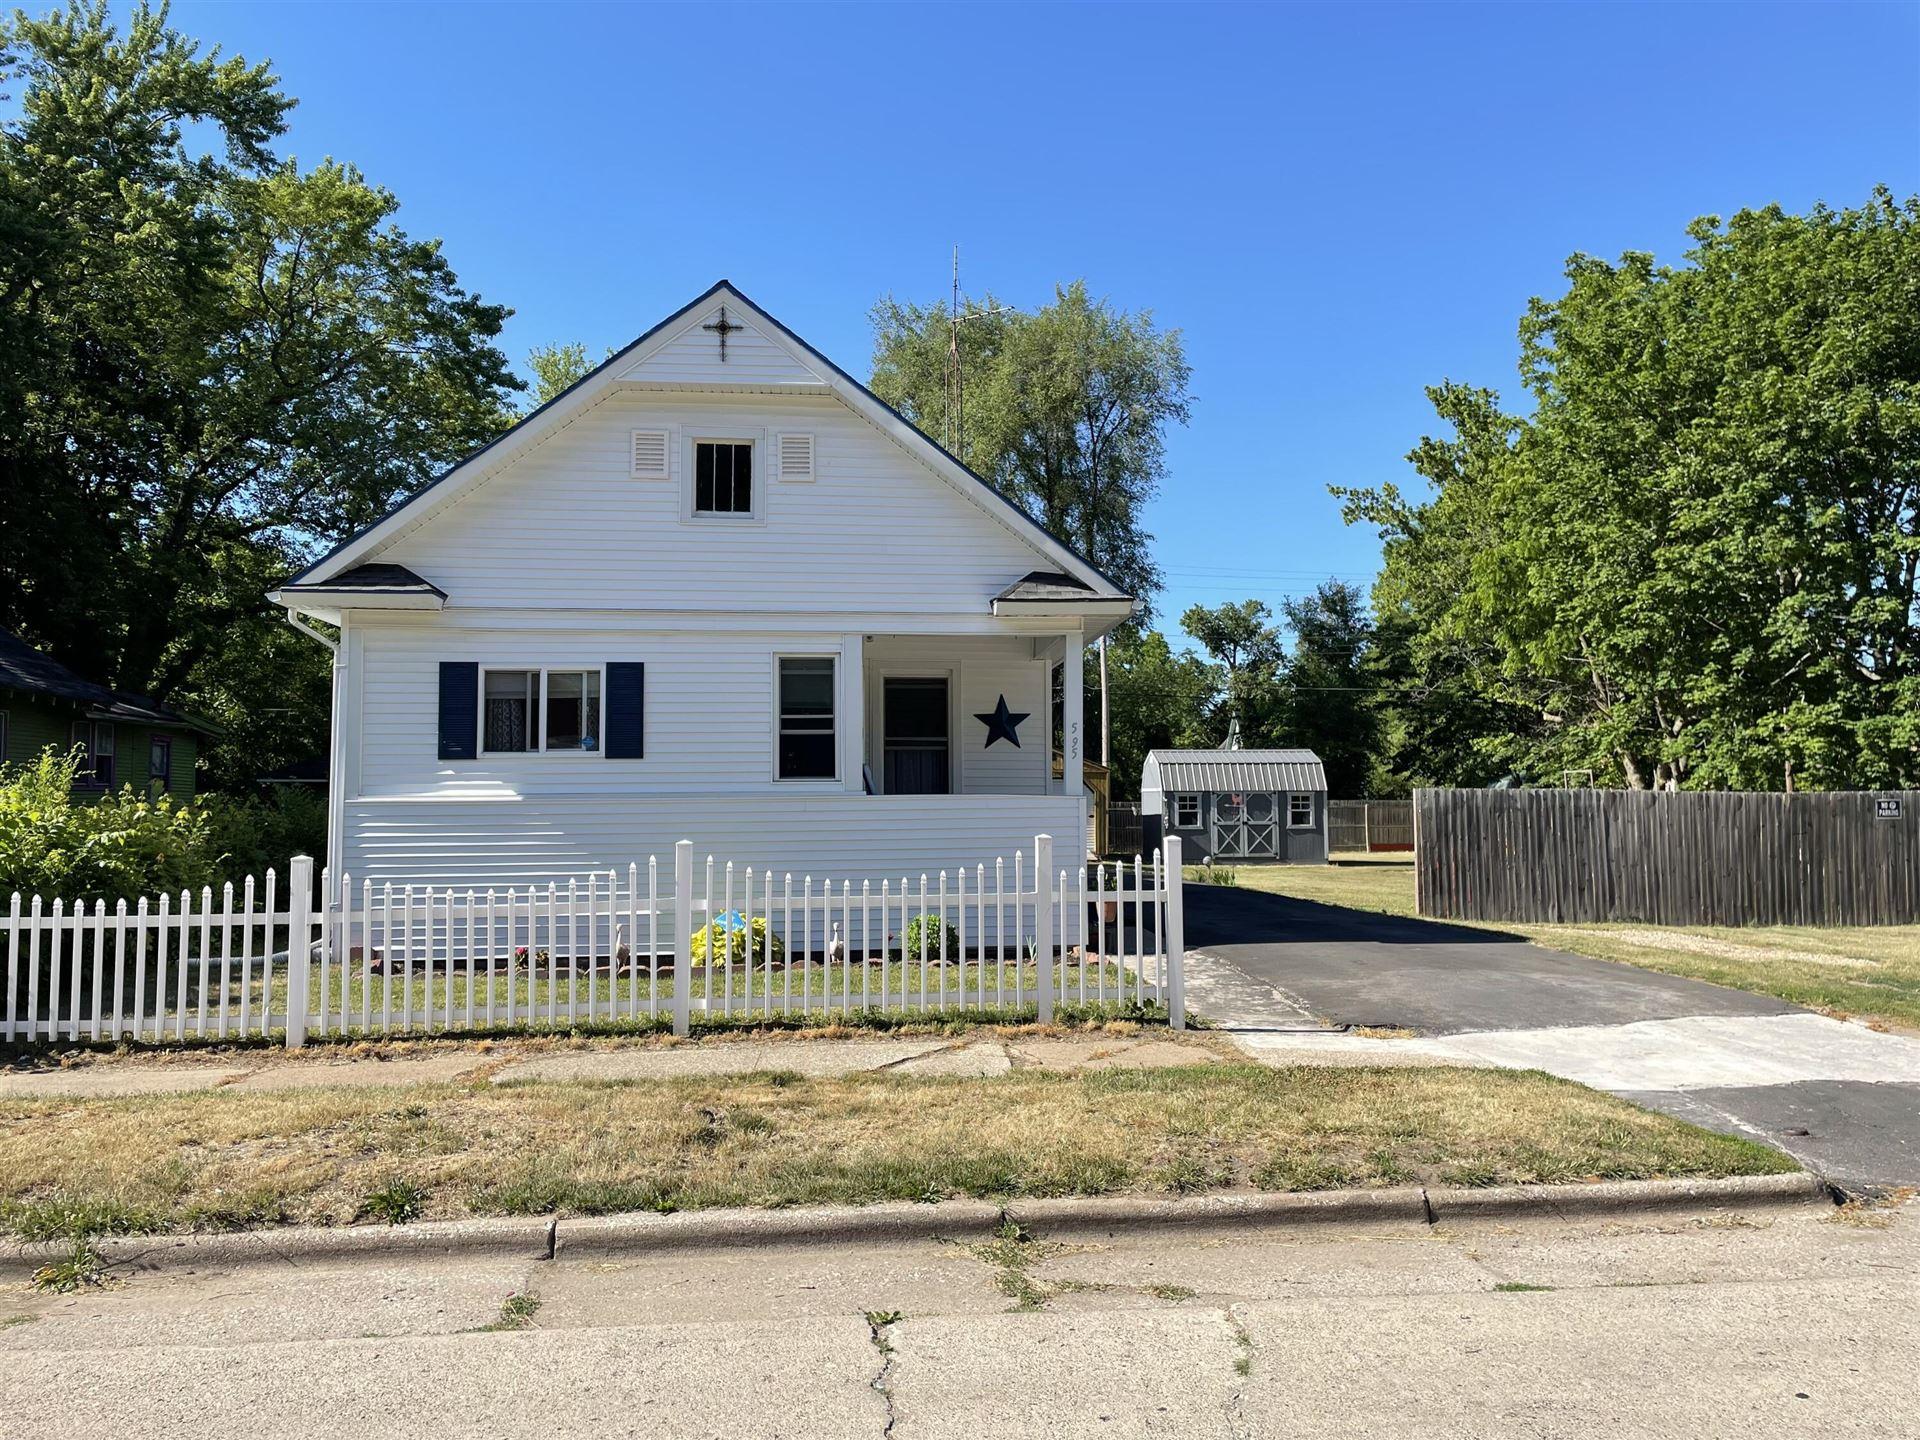 595 Clay Street, Benton Harbor, MI 49022 - MLS#: 21023241